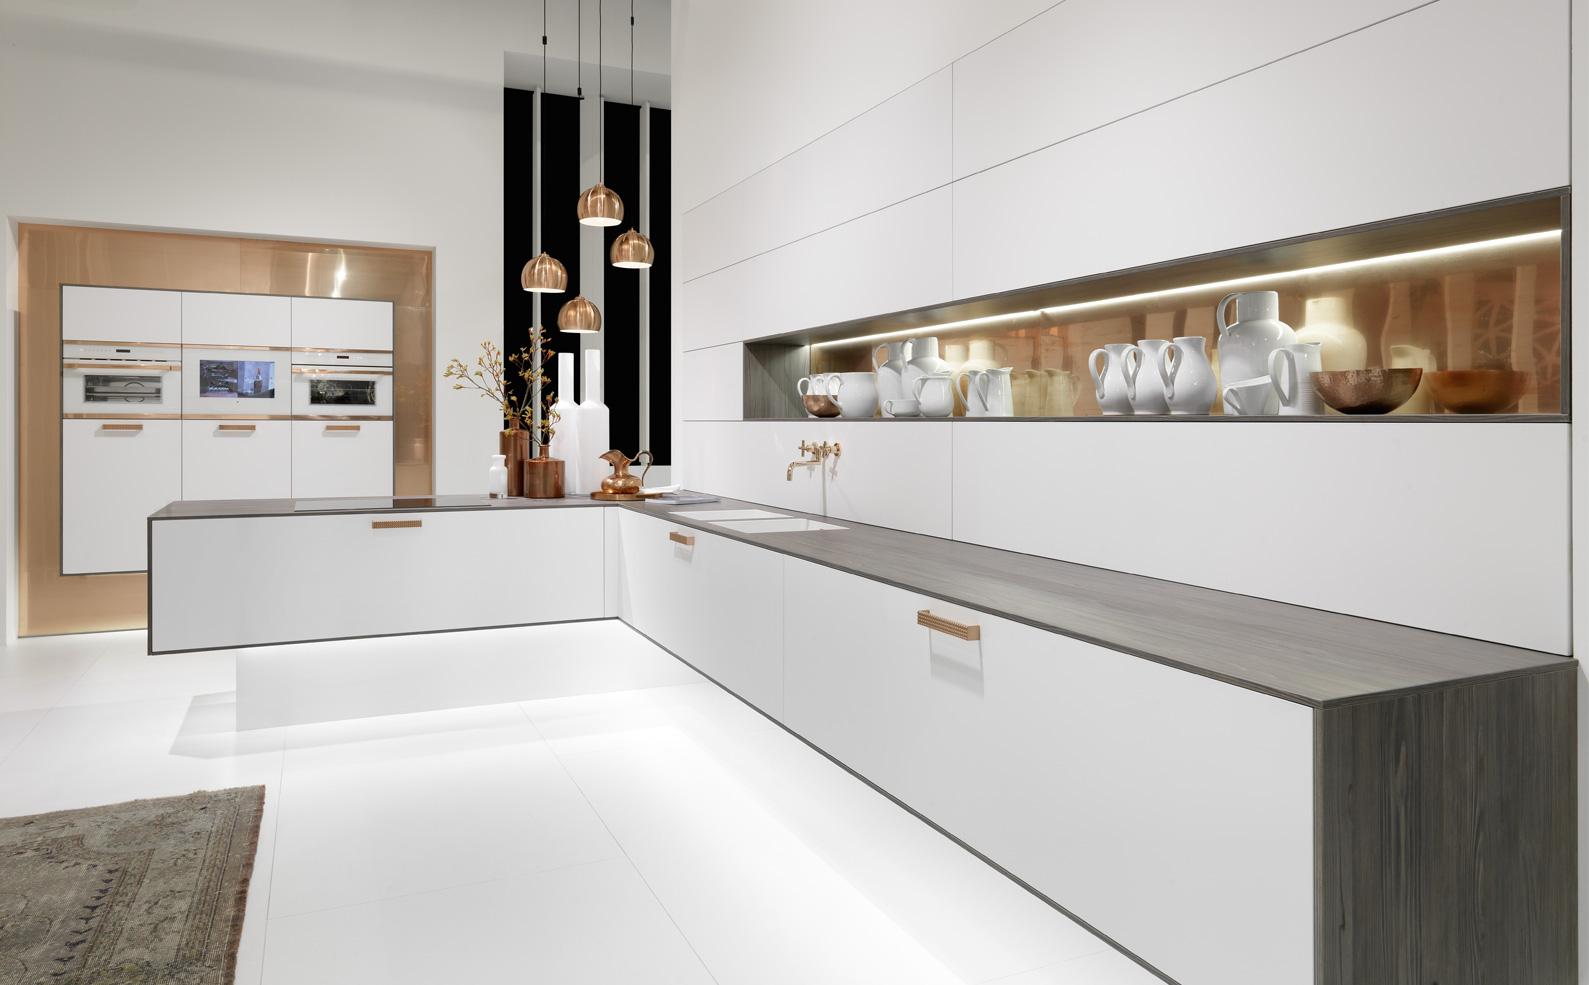 Kitchen Direct Australia - Kitchen Renovations Sydney Slide 4